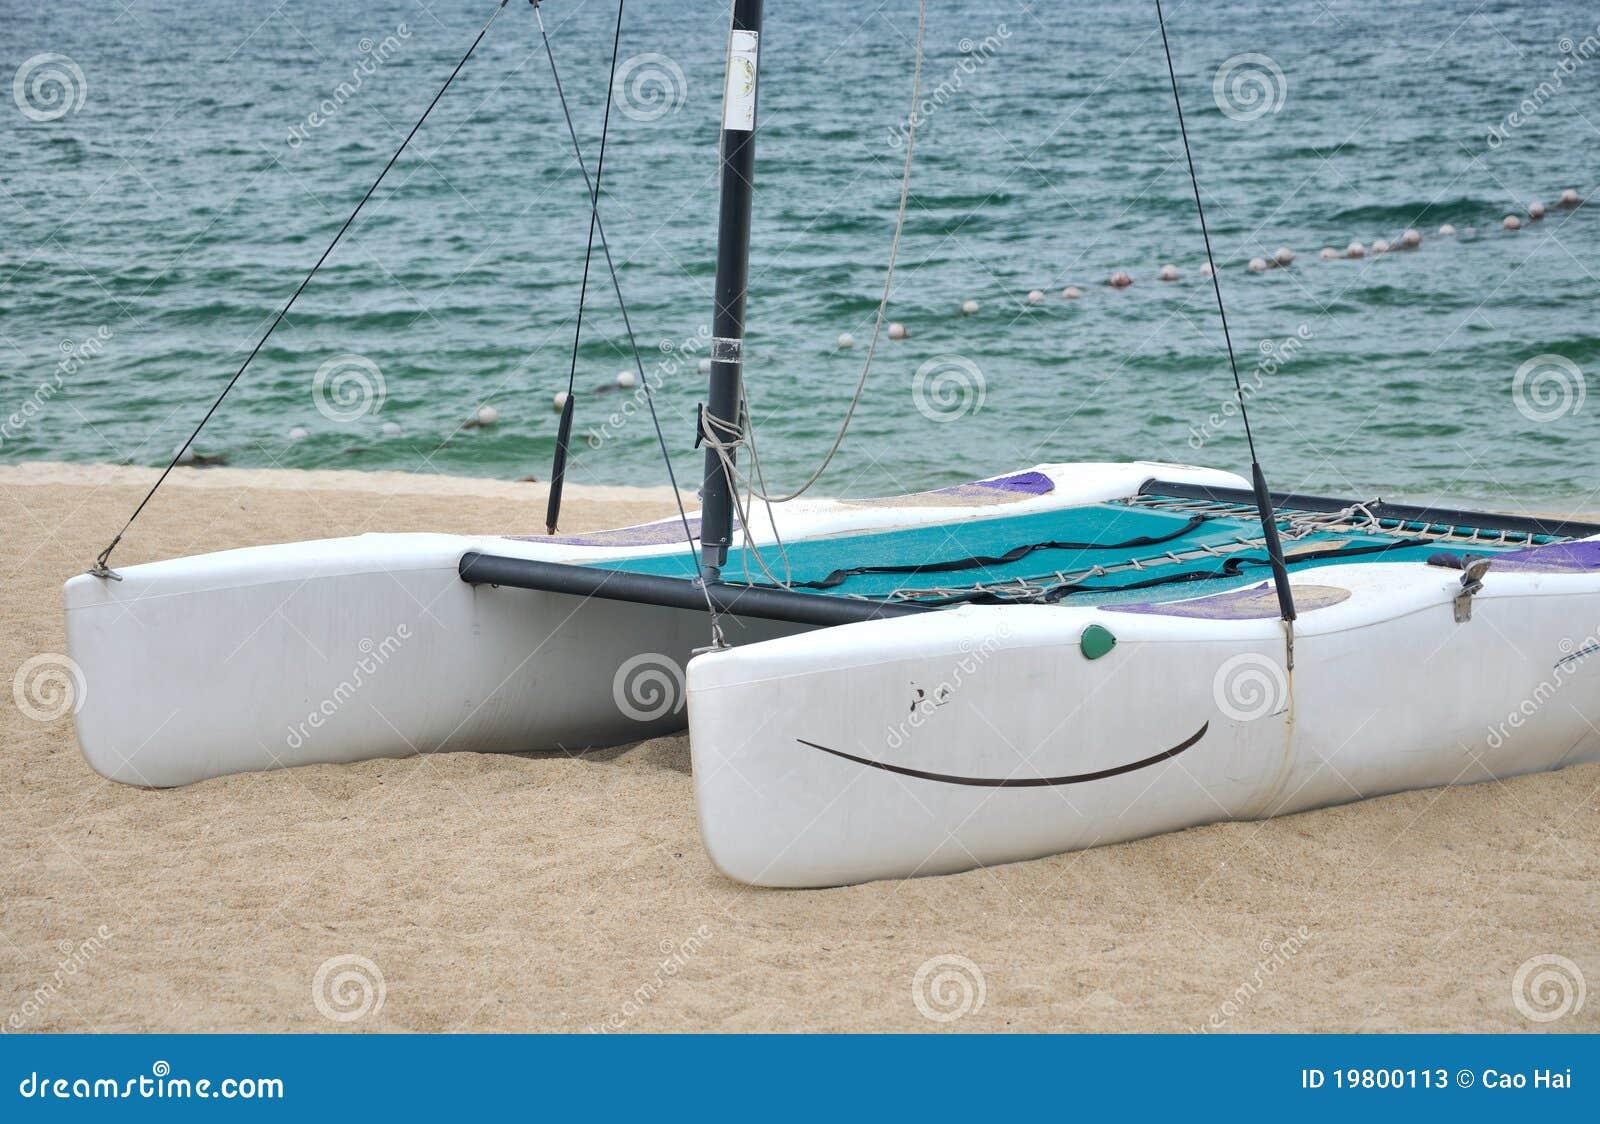 Small Catamaran On Beach Sand Stock Photos - Image: 19800113